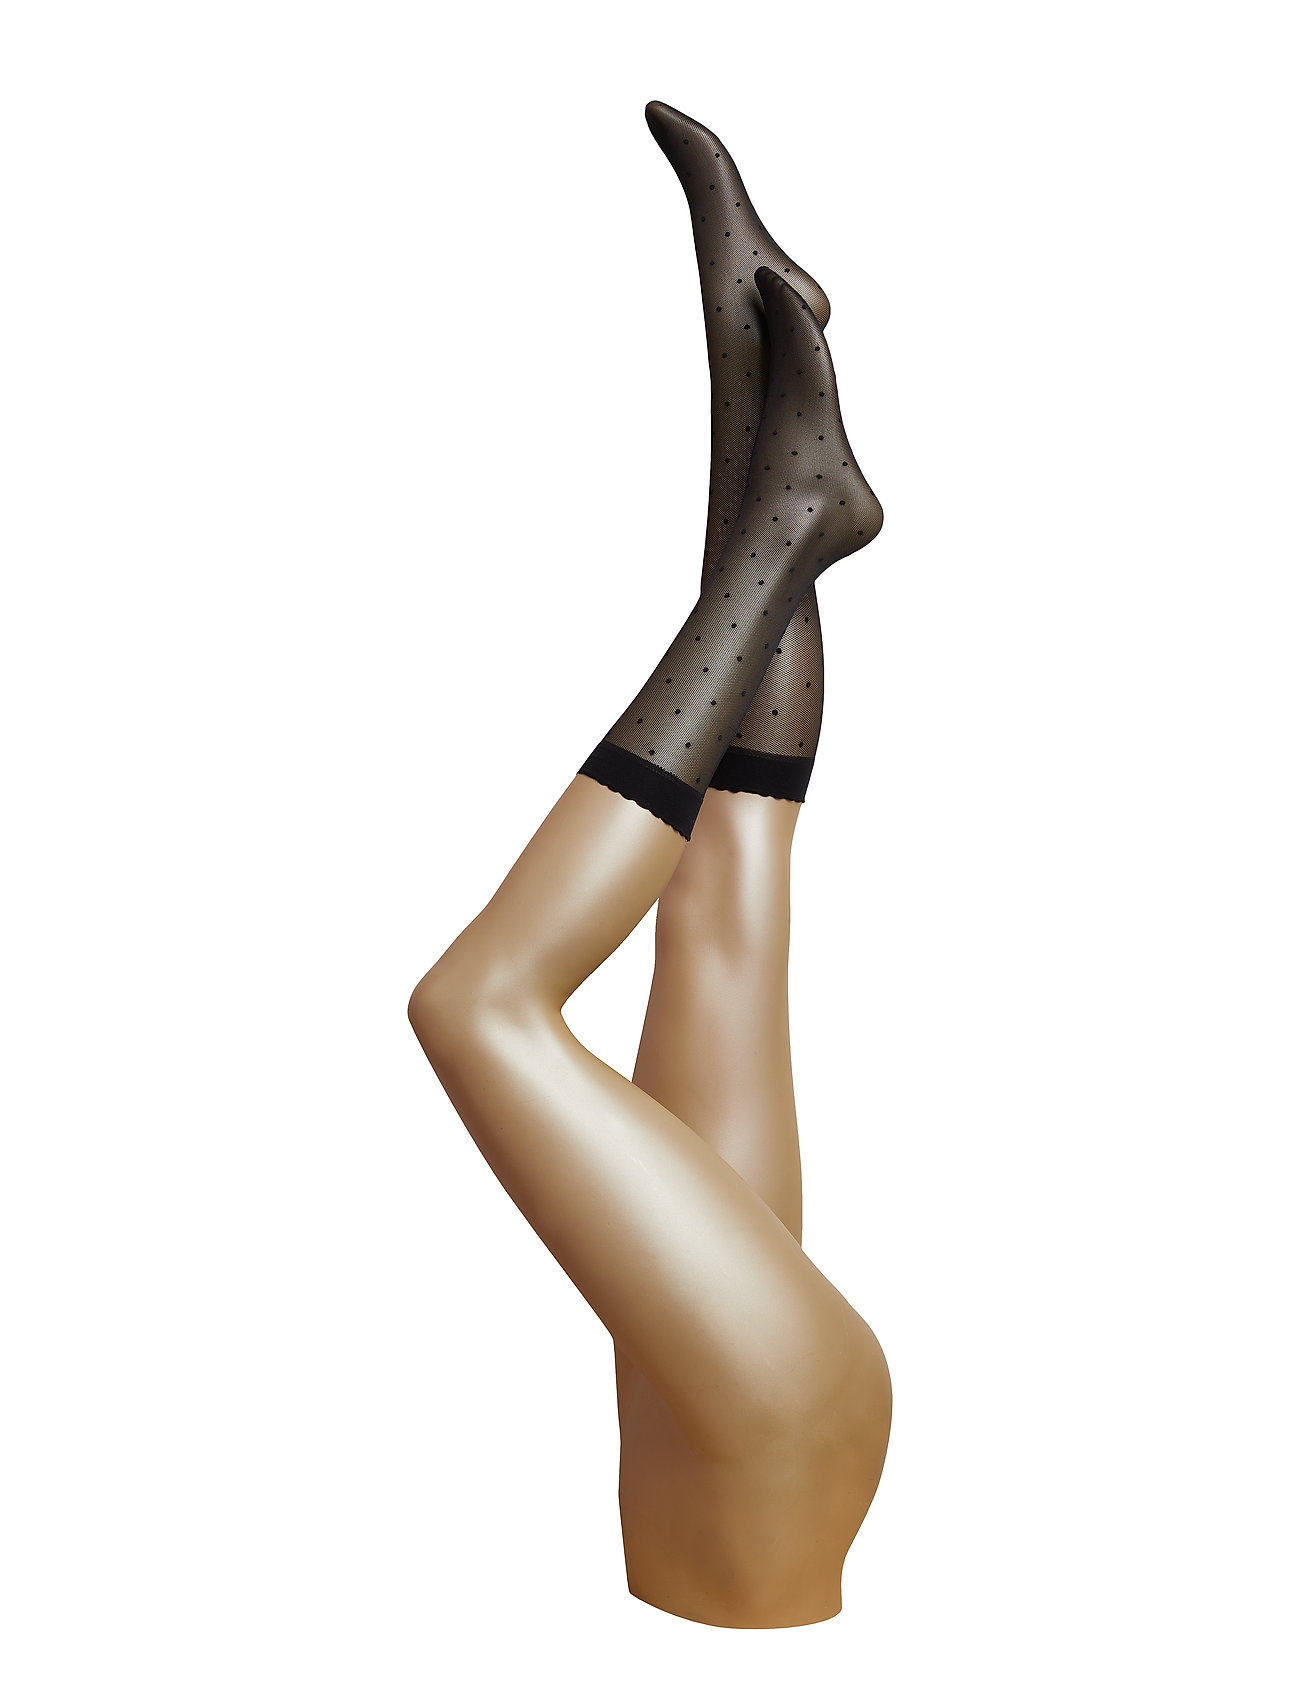 Rehband UD Runners Knee/ITBS Tights Women S Black